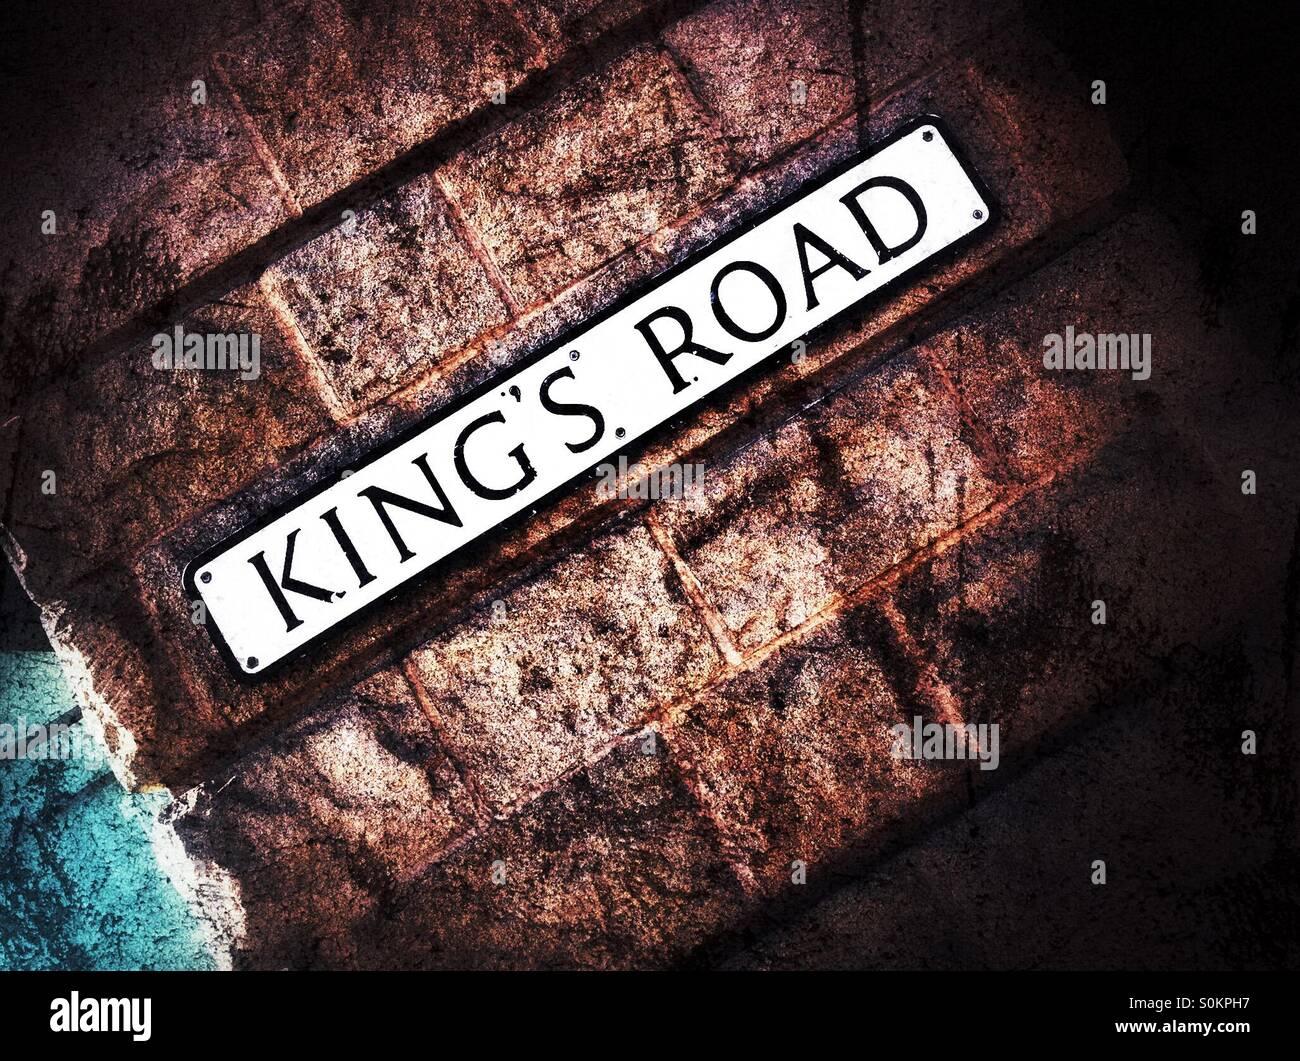 King's Road sign Harrogate North Yorkshire England UK - Stock Image